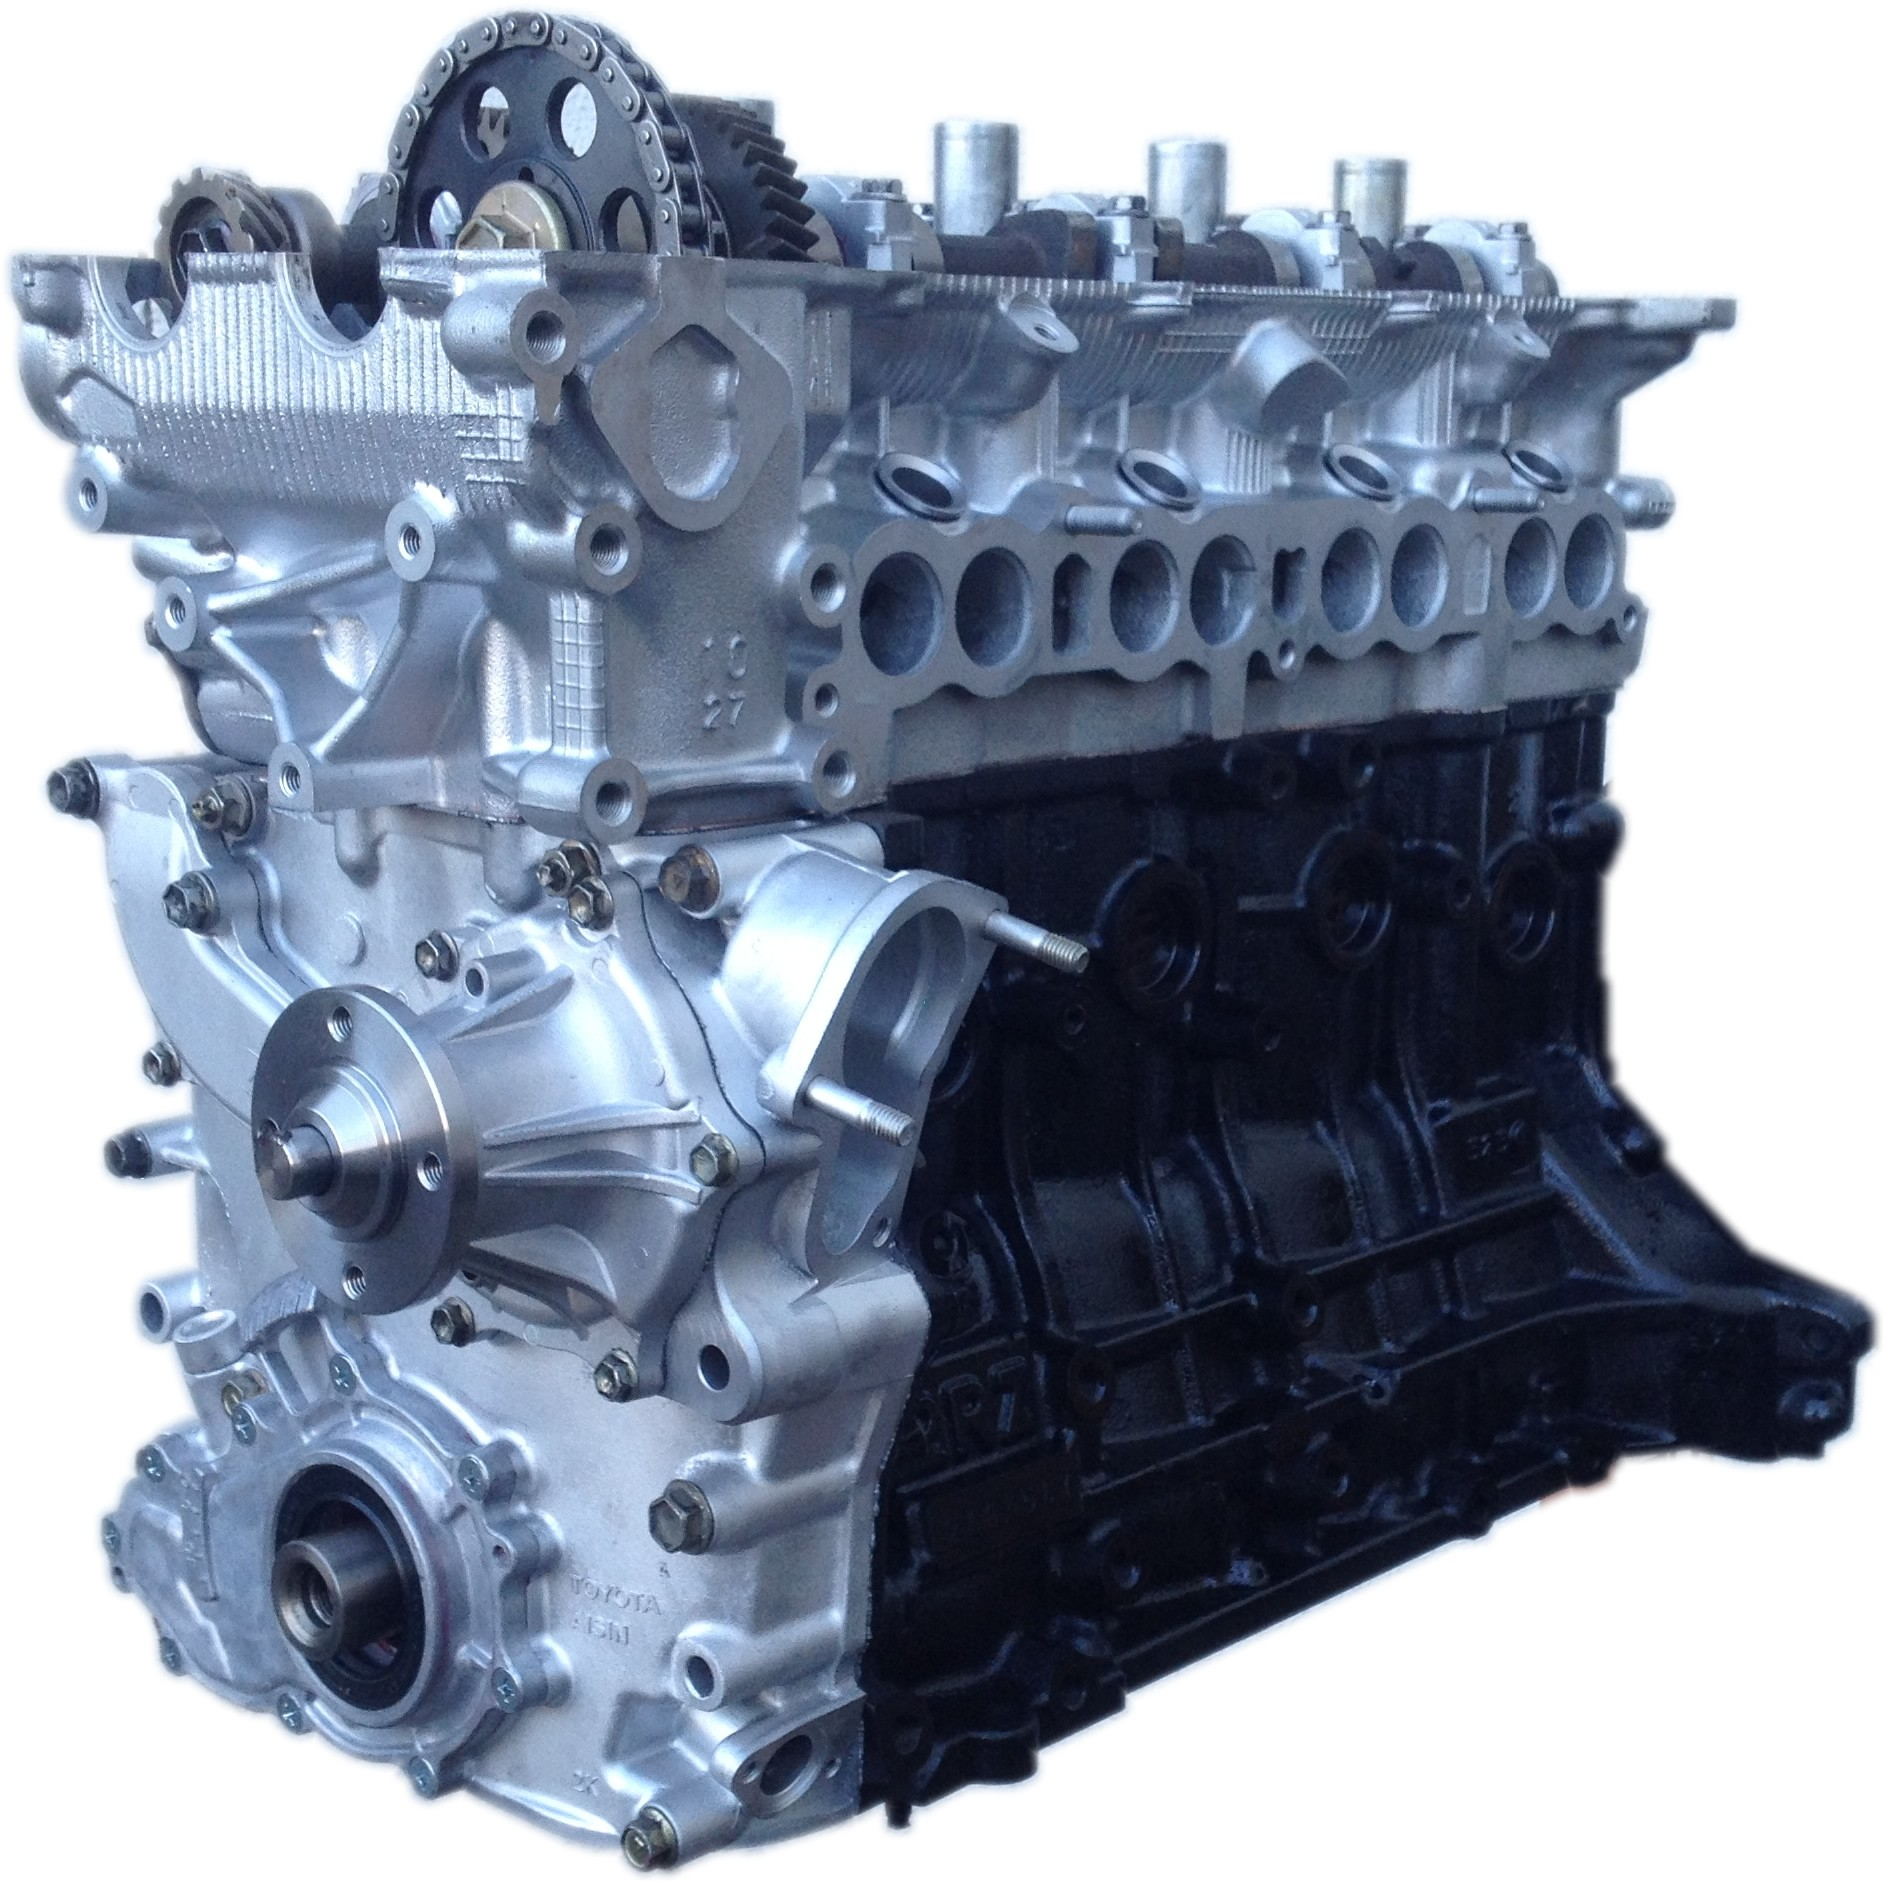 Rebuilt 95 97 Toyota Tacoma 2rzfe 2 4l Engine Kar King Auto